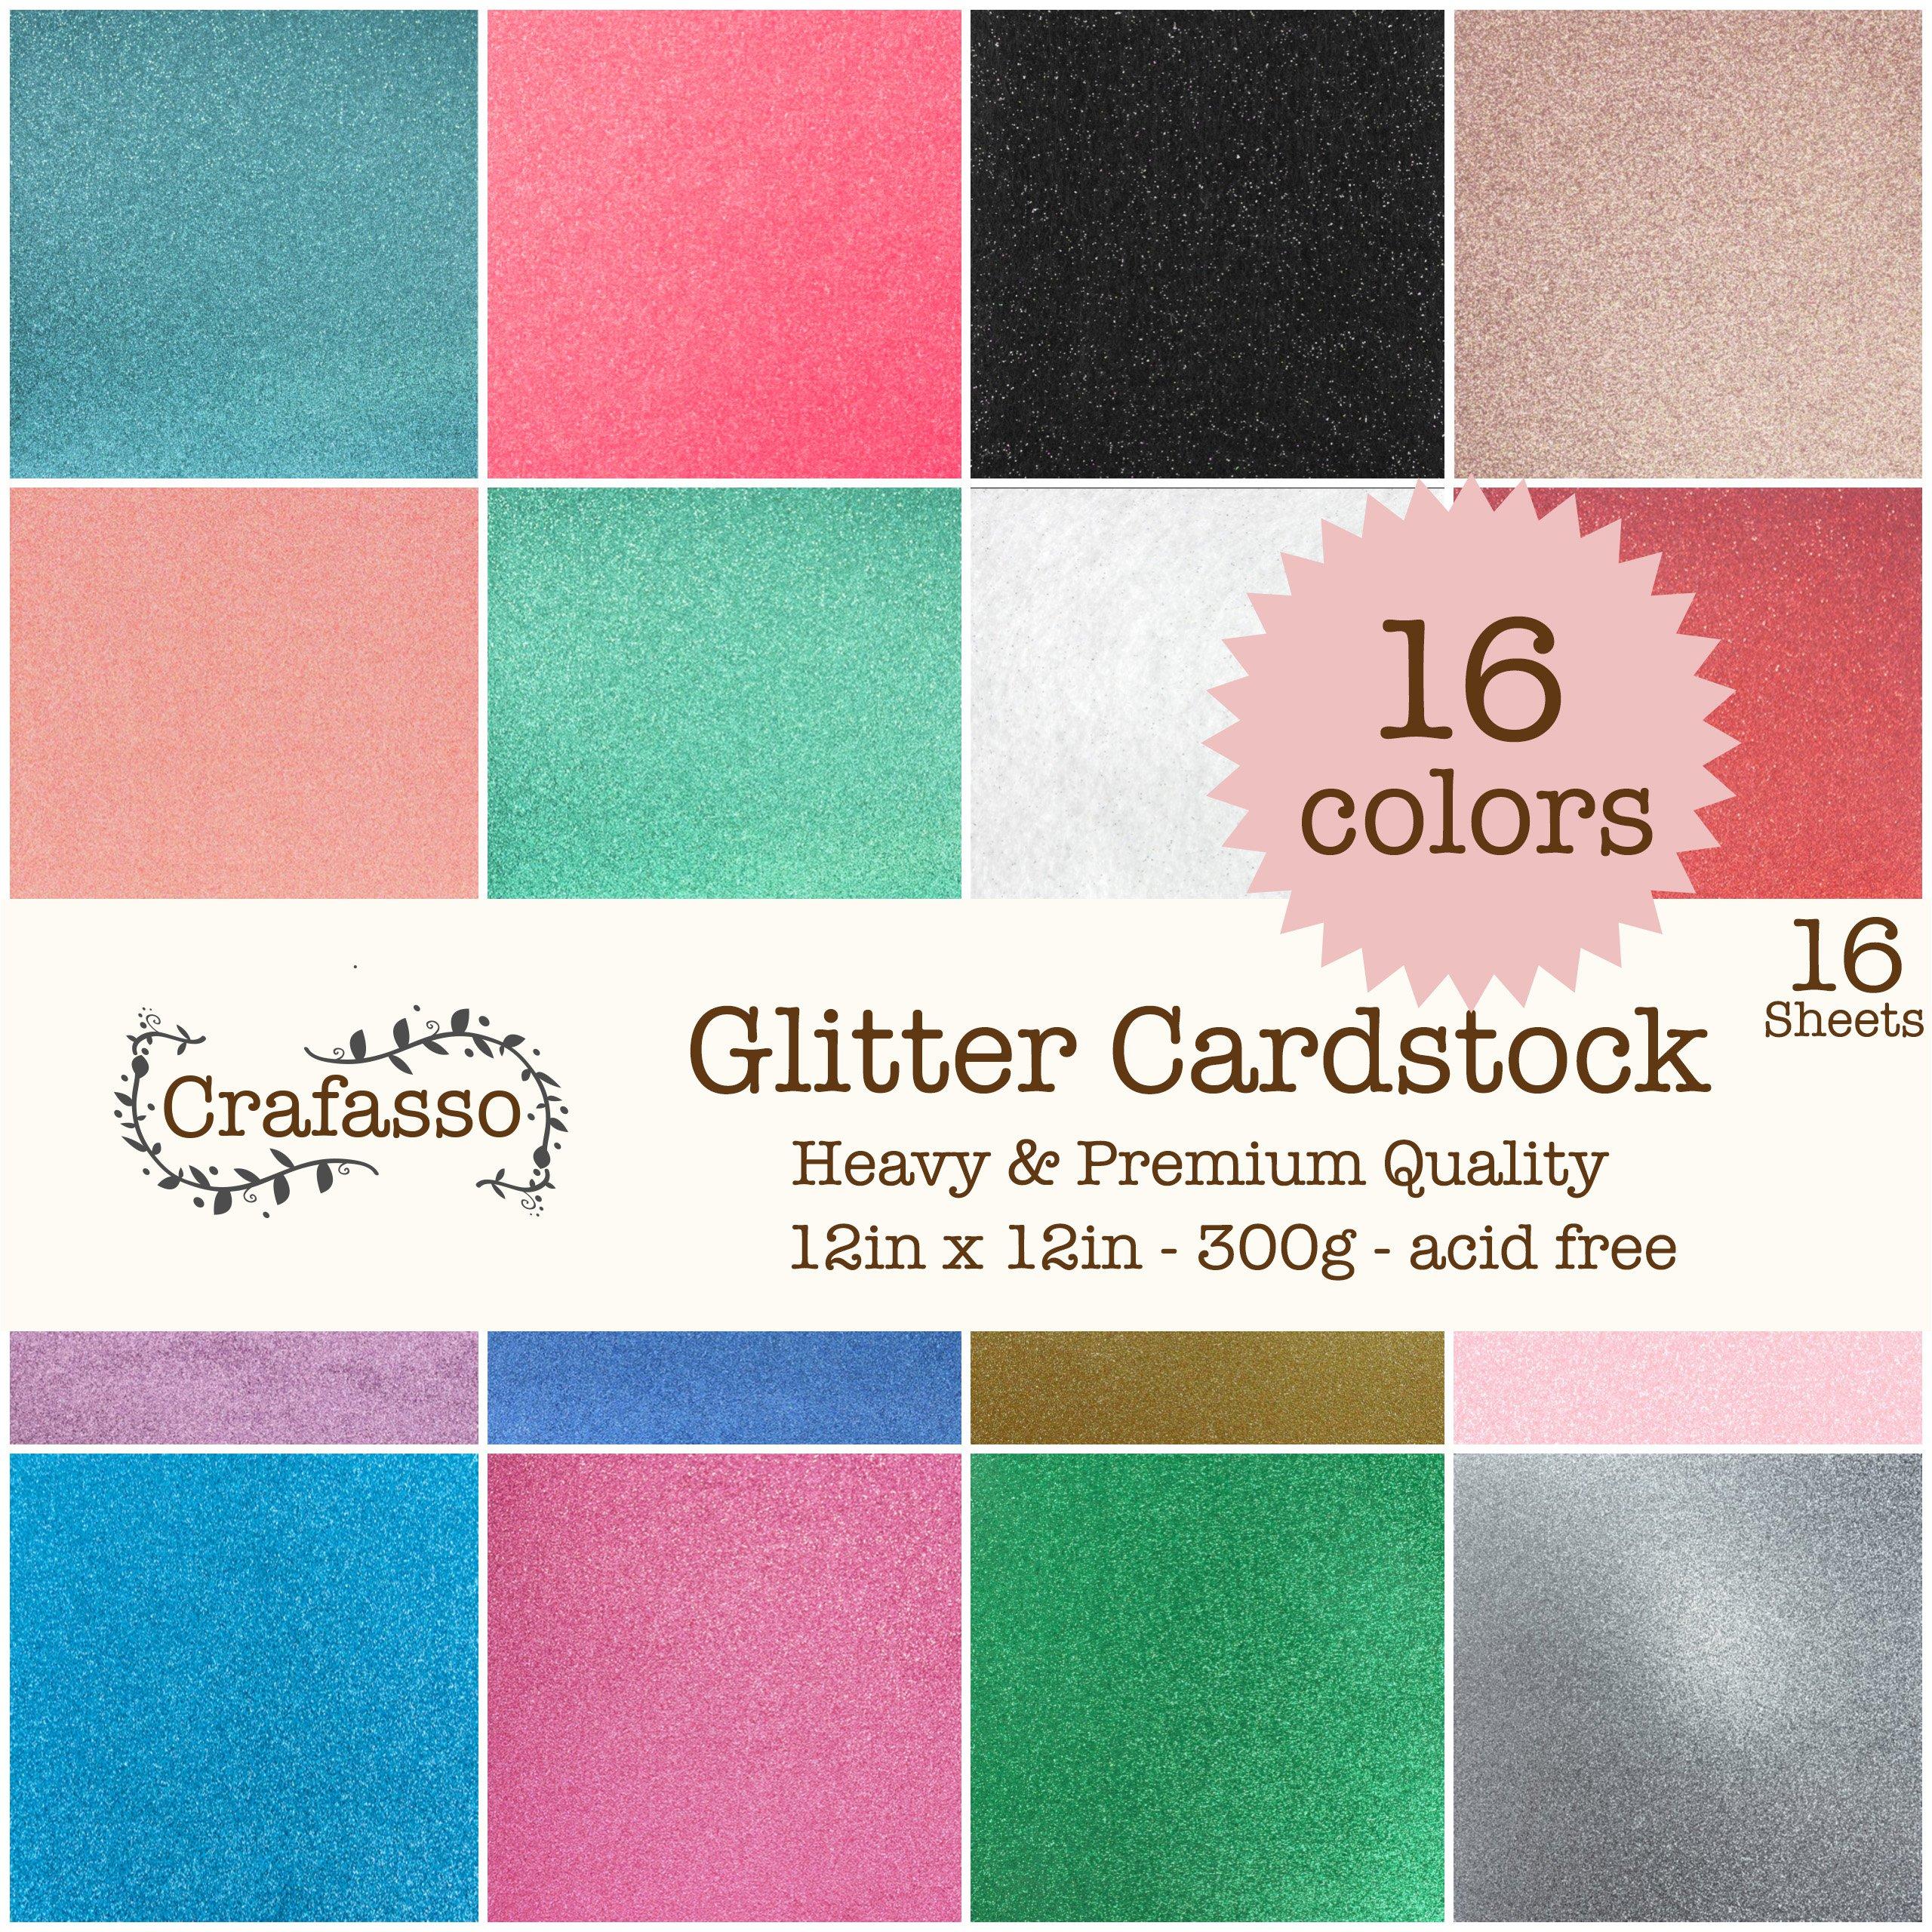 Crafasso 12'' x 12'' 300gms Heavy & Premium cardstock, 16 Sheets, 16 Colors